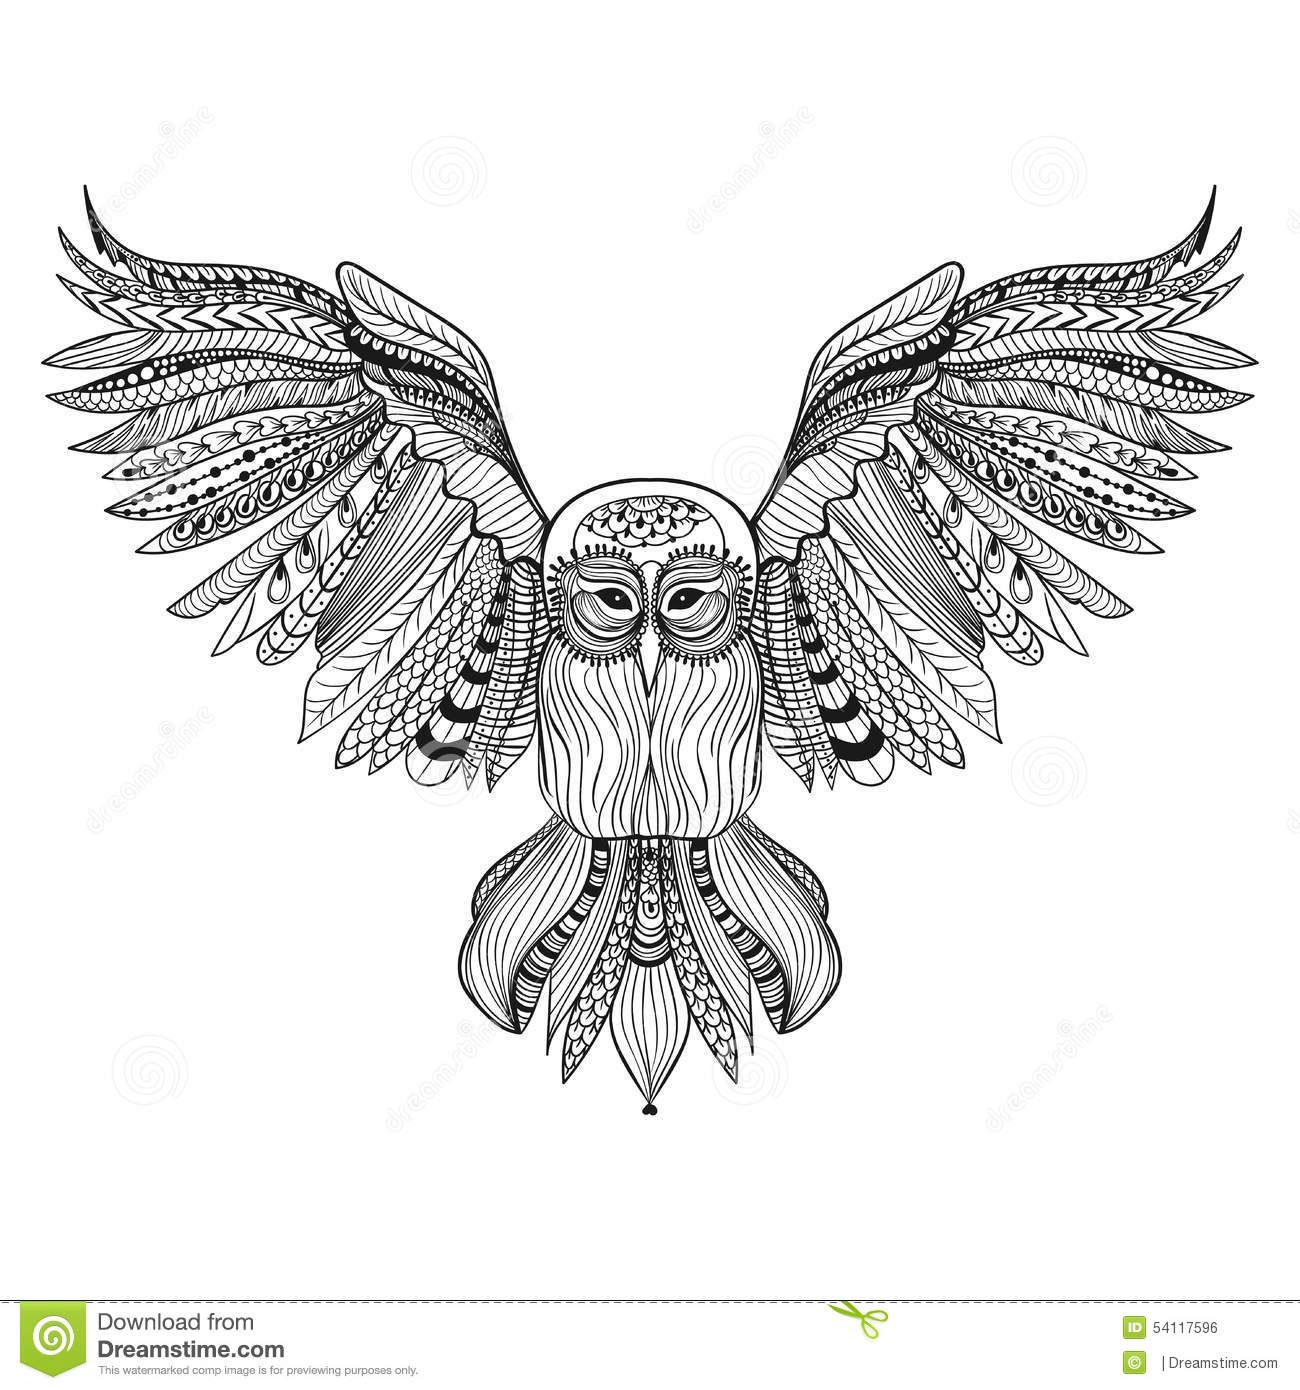 Zentangle Stylized Black Owl Hand Drawn Illustration